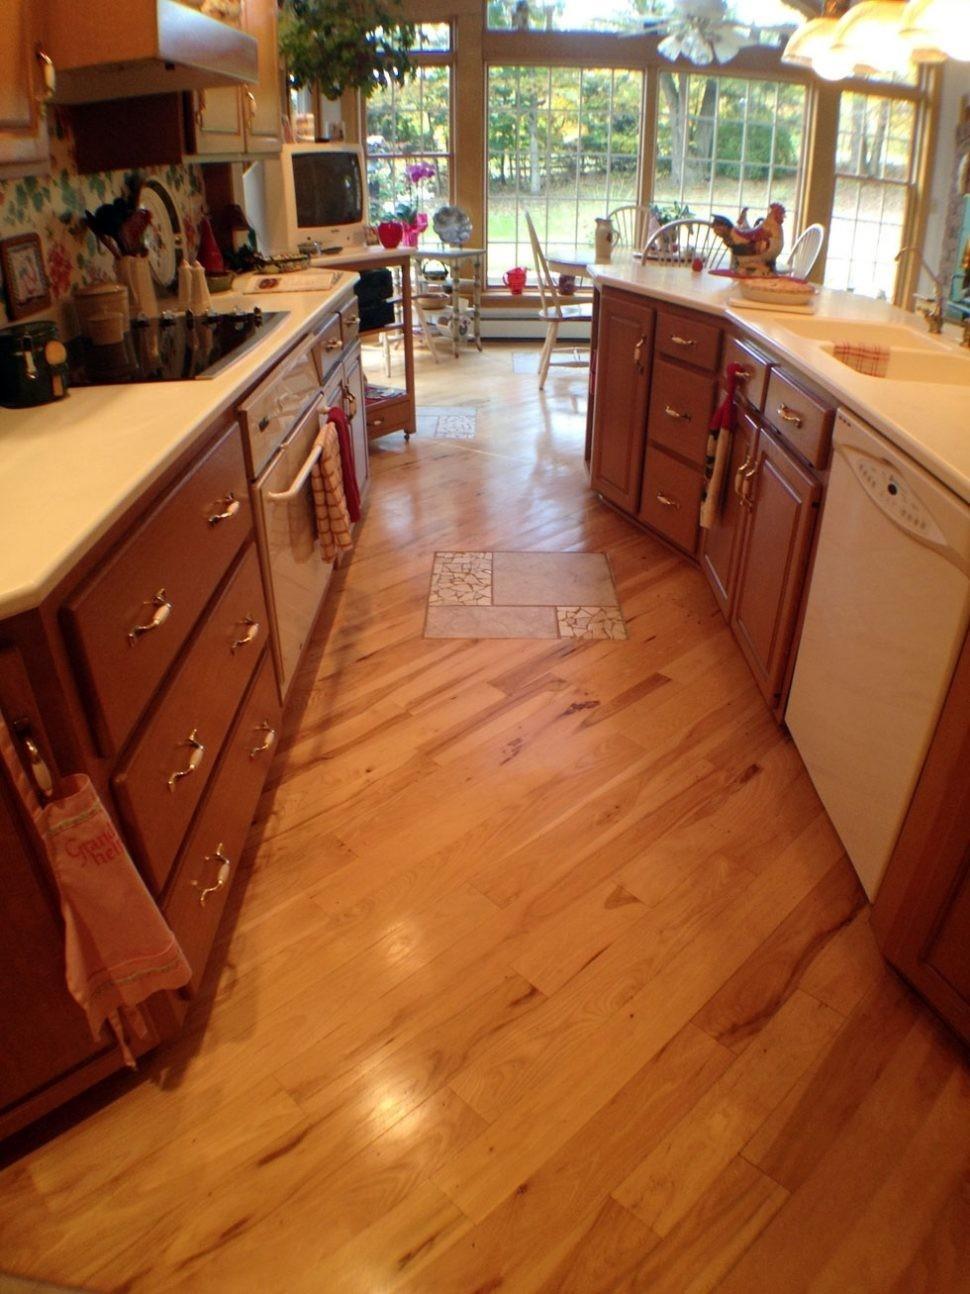 Bamboo Hardwood Flooring Cost Of 17 New Cost Of Hardwood Floor Installation Pics Dizpos Com In 16 Lovely S Hardwood Floor Installation Cost